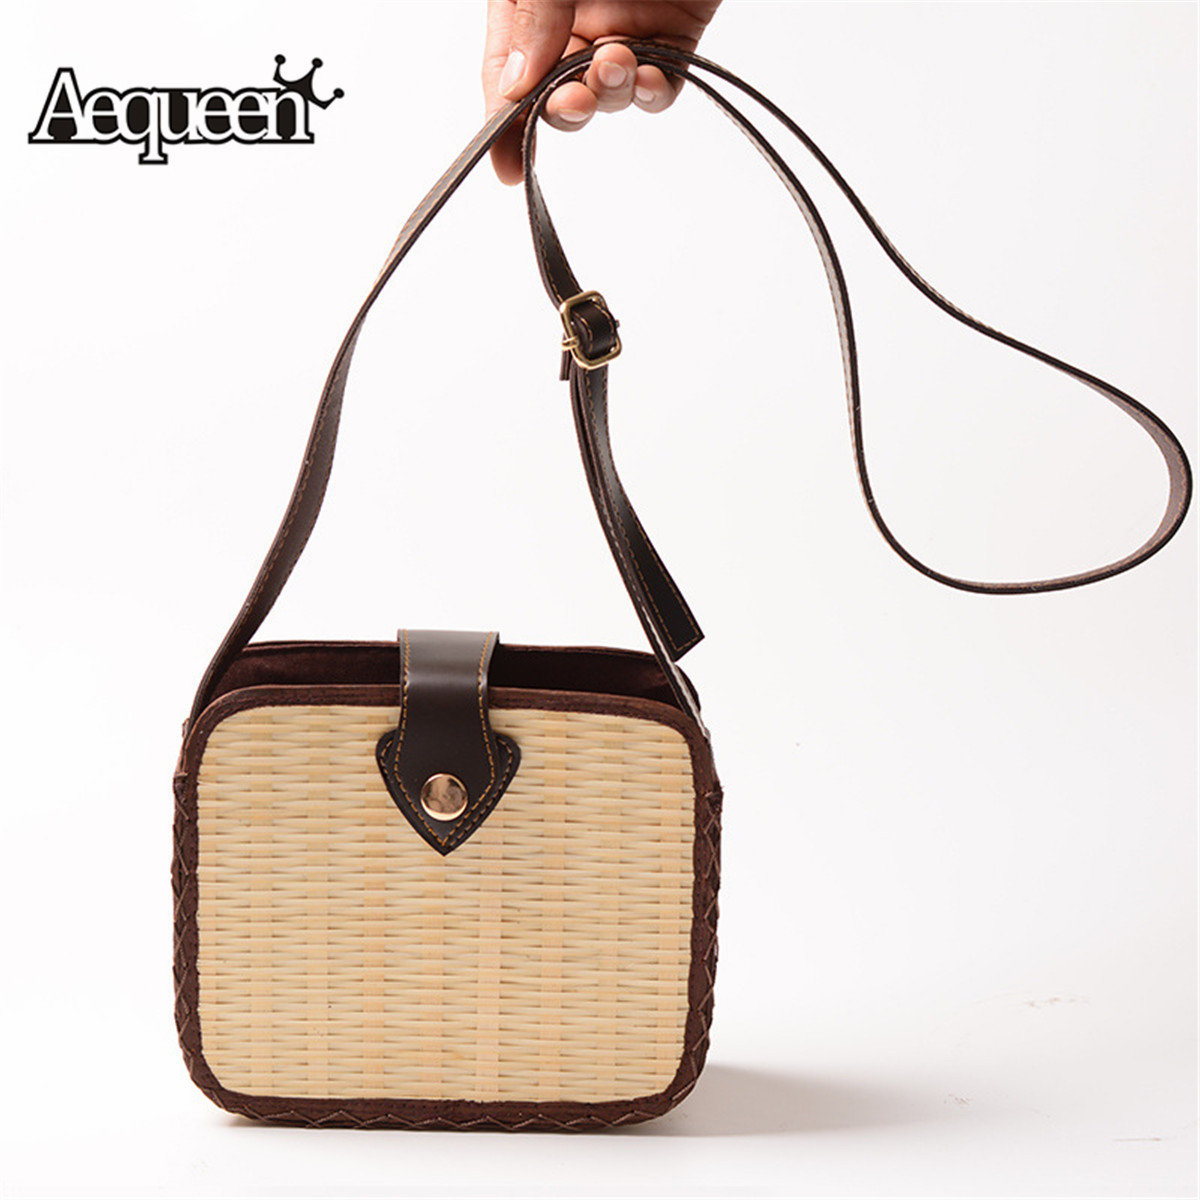 Aequeen Women Straw Weave Shoulder Lady Beach Purse Handbag Shopping Tote Bag US